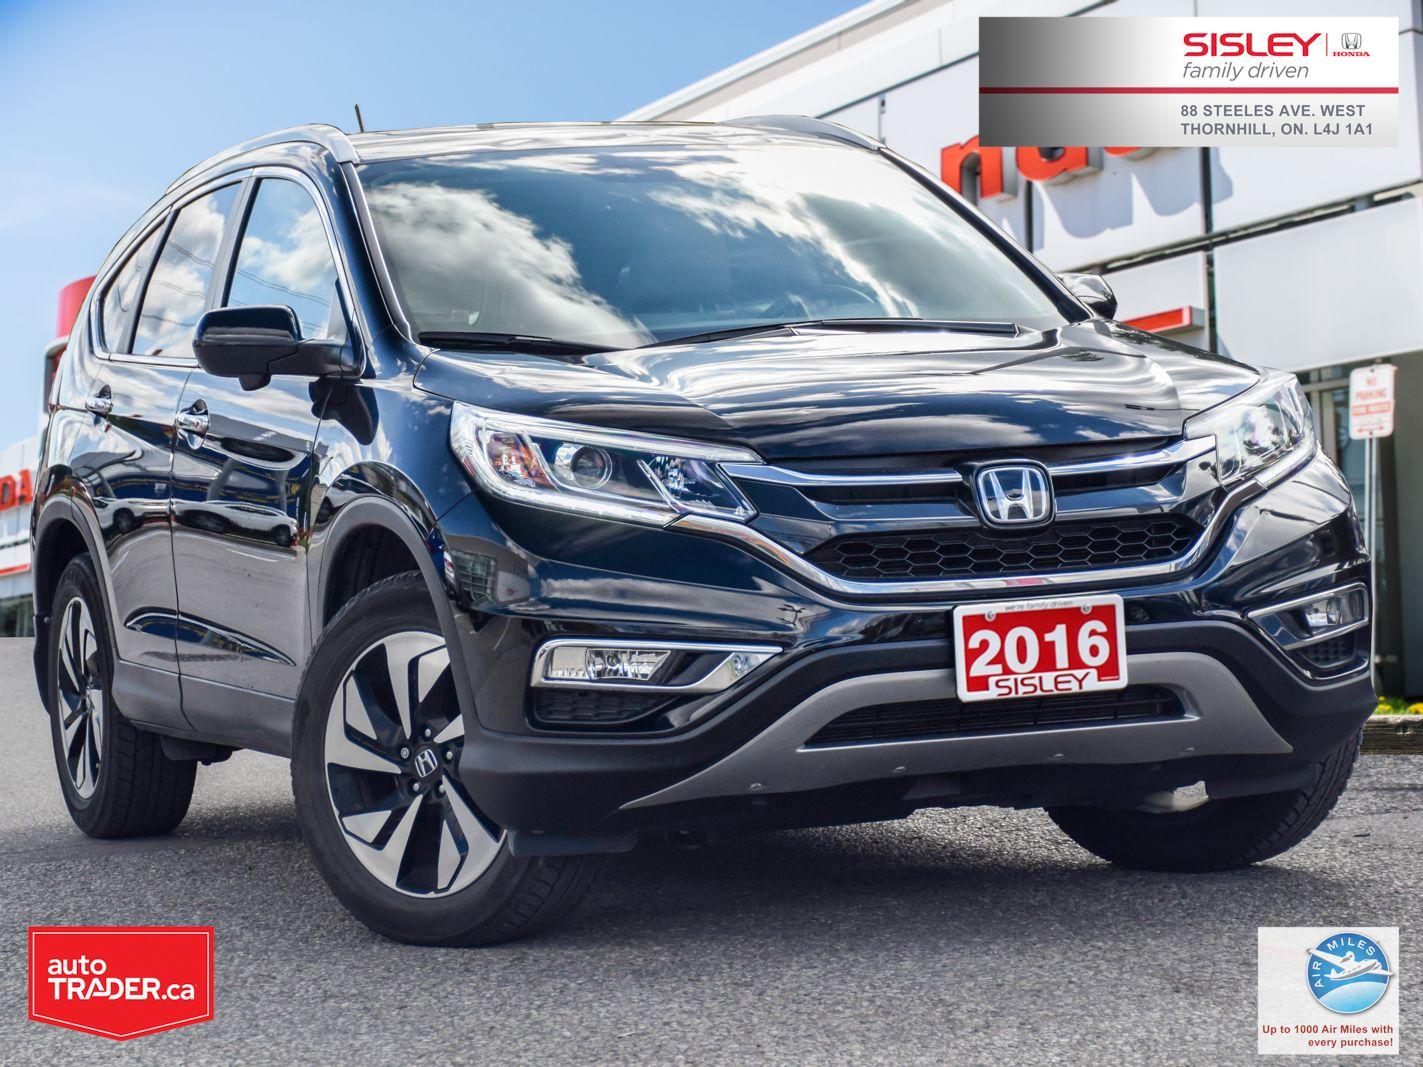 2016 Honda CR-V Image